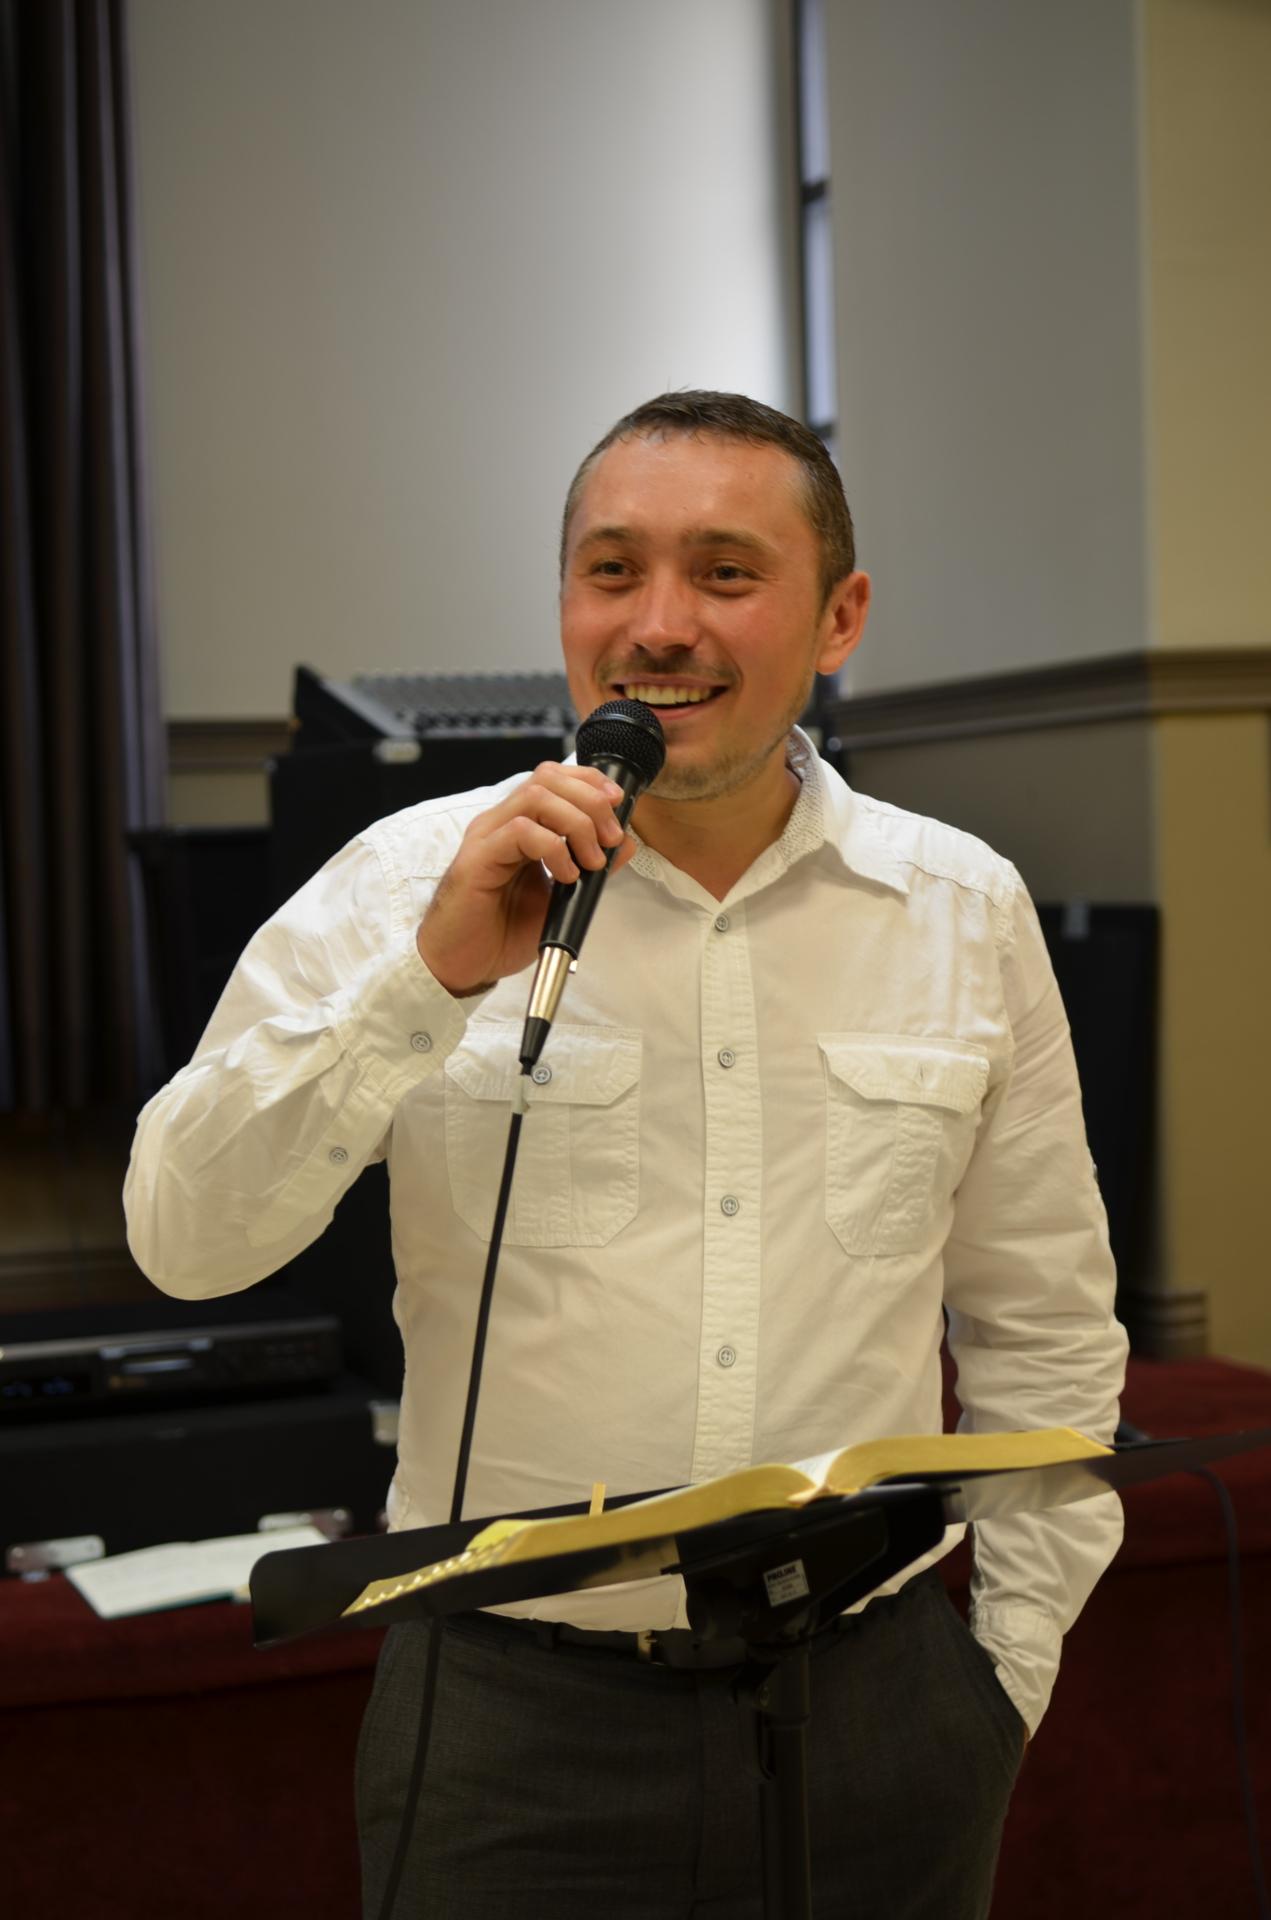 Anatoliy Kiselev